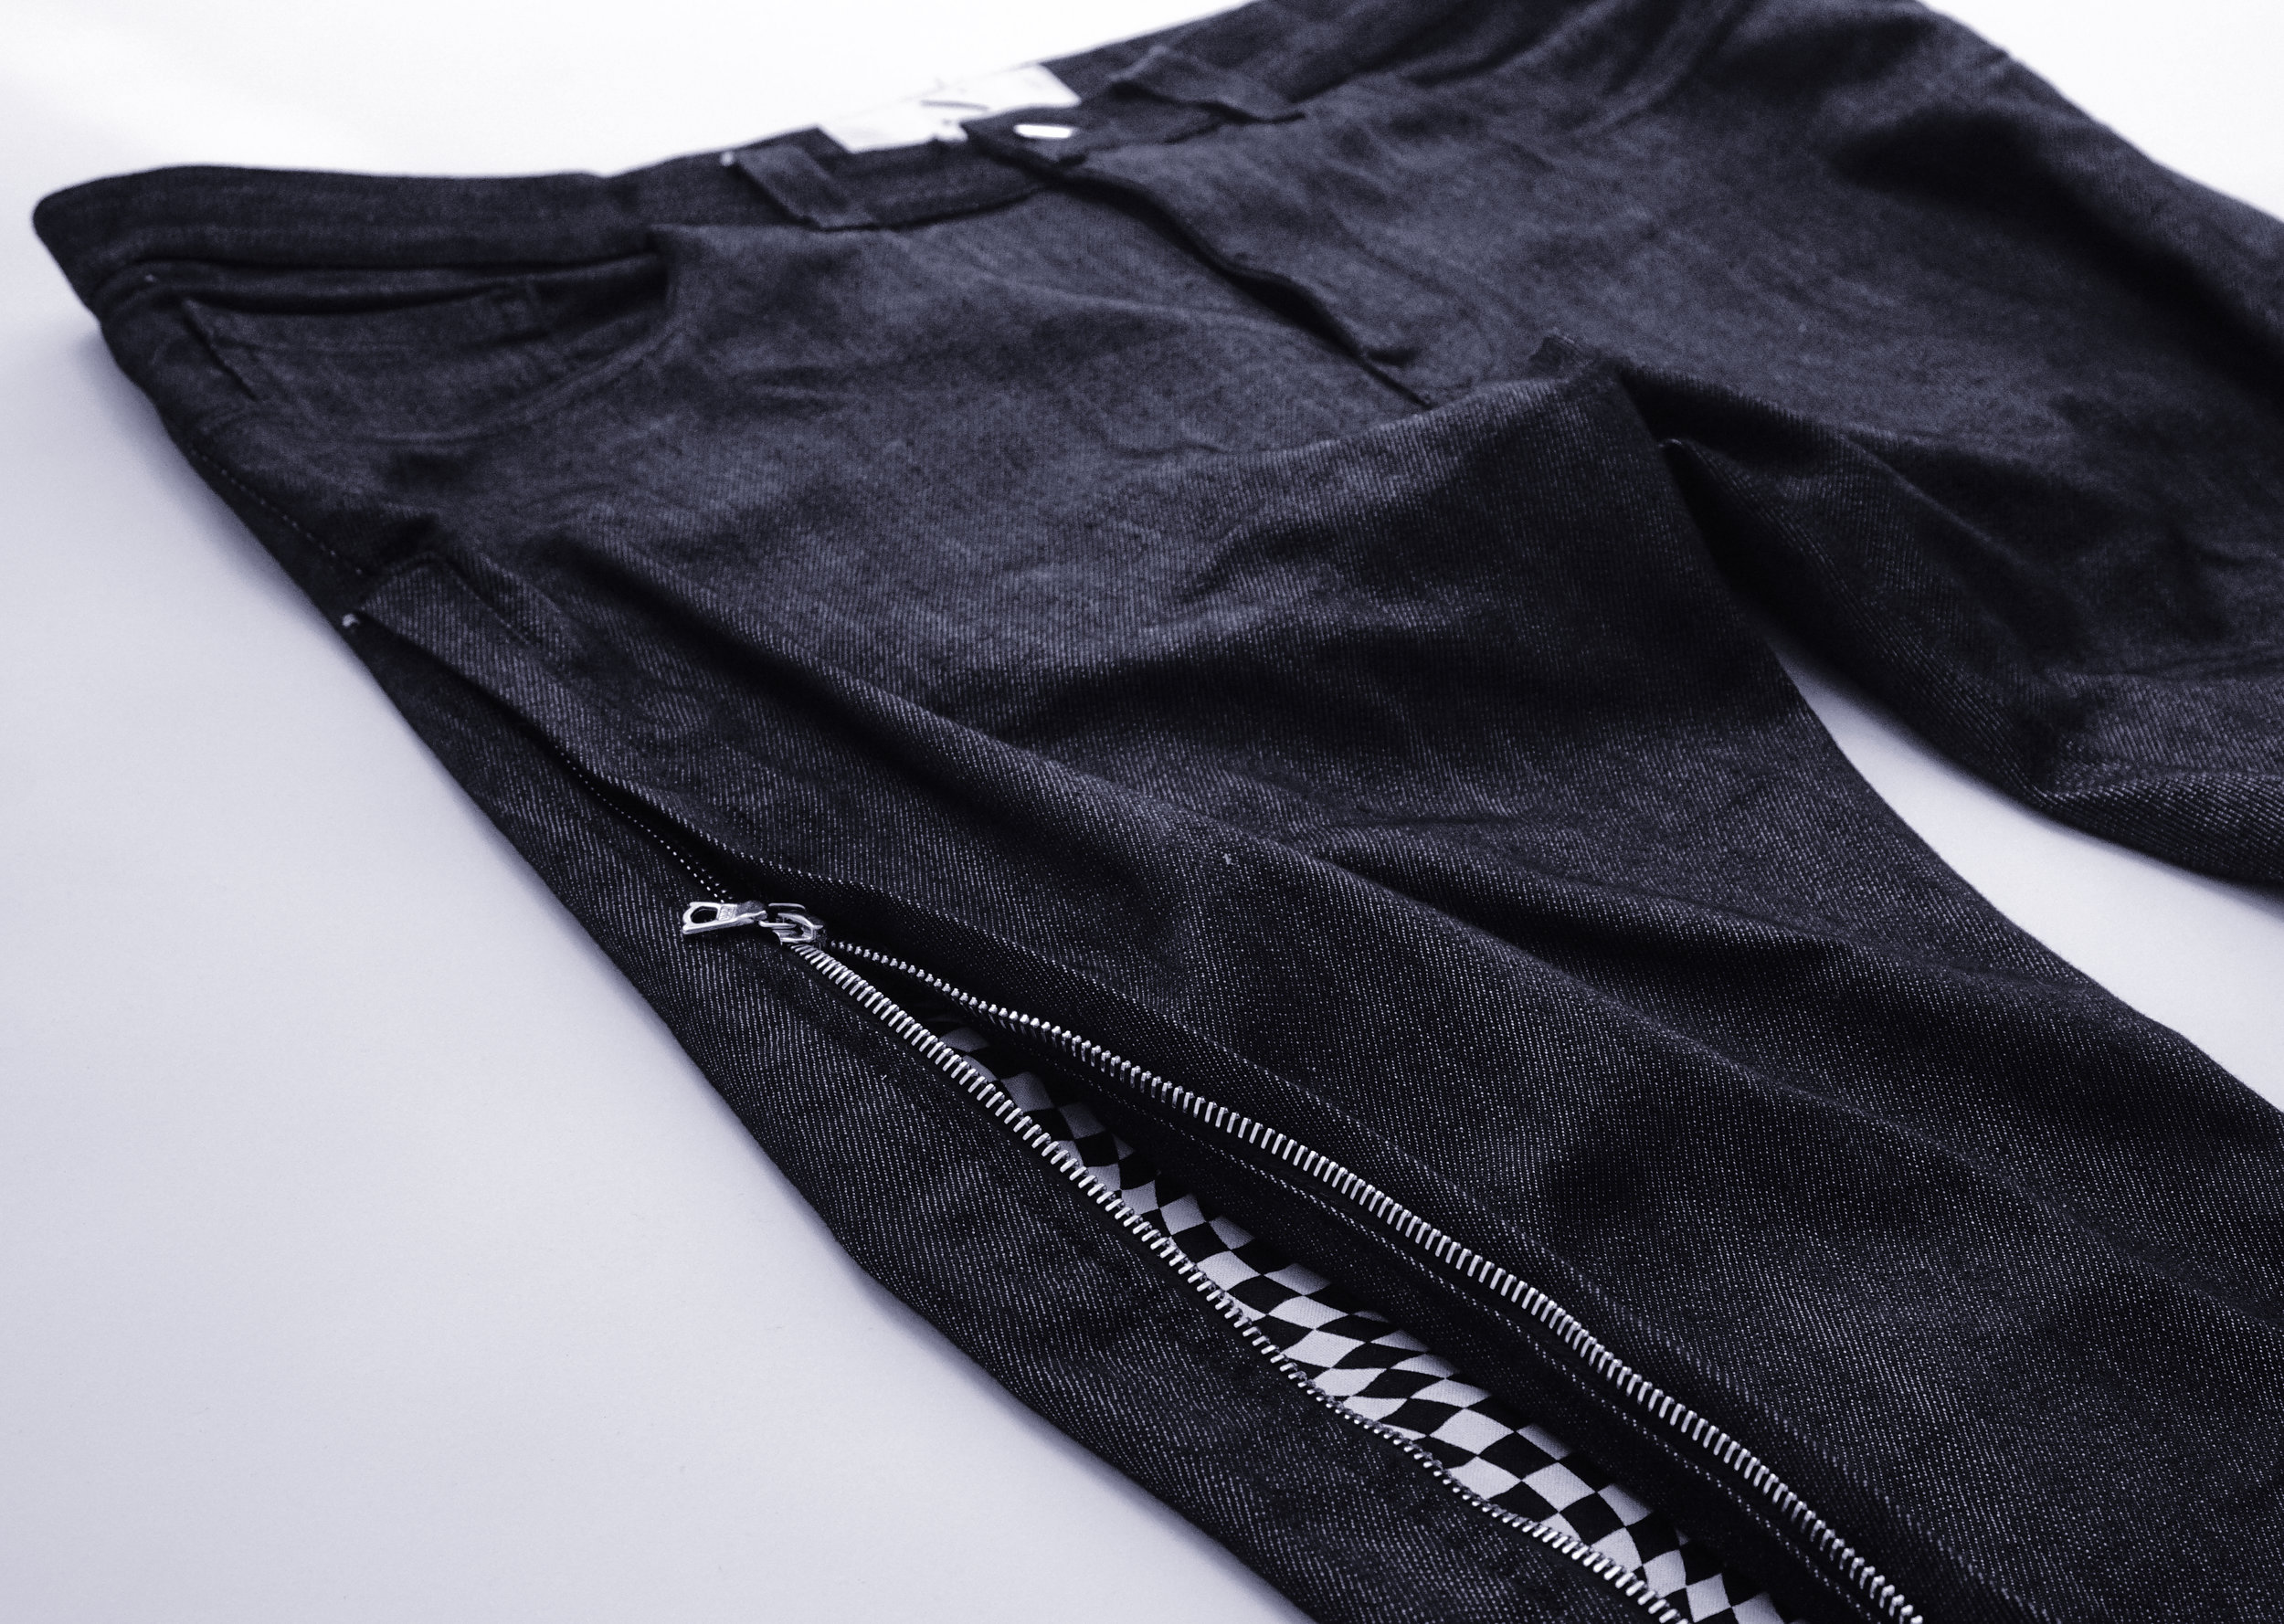 Zip Jeans Details 122.jpg